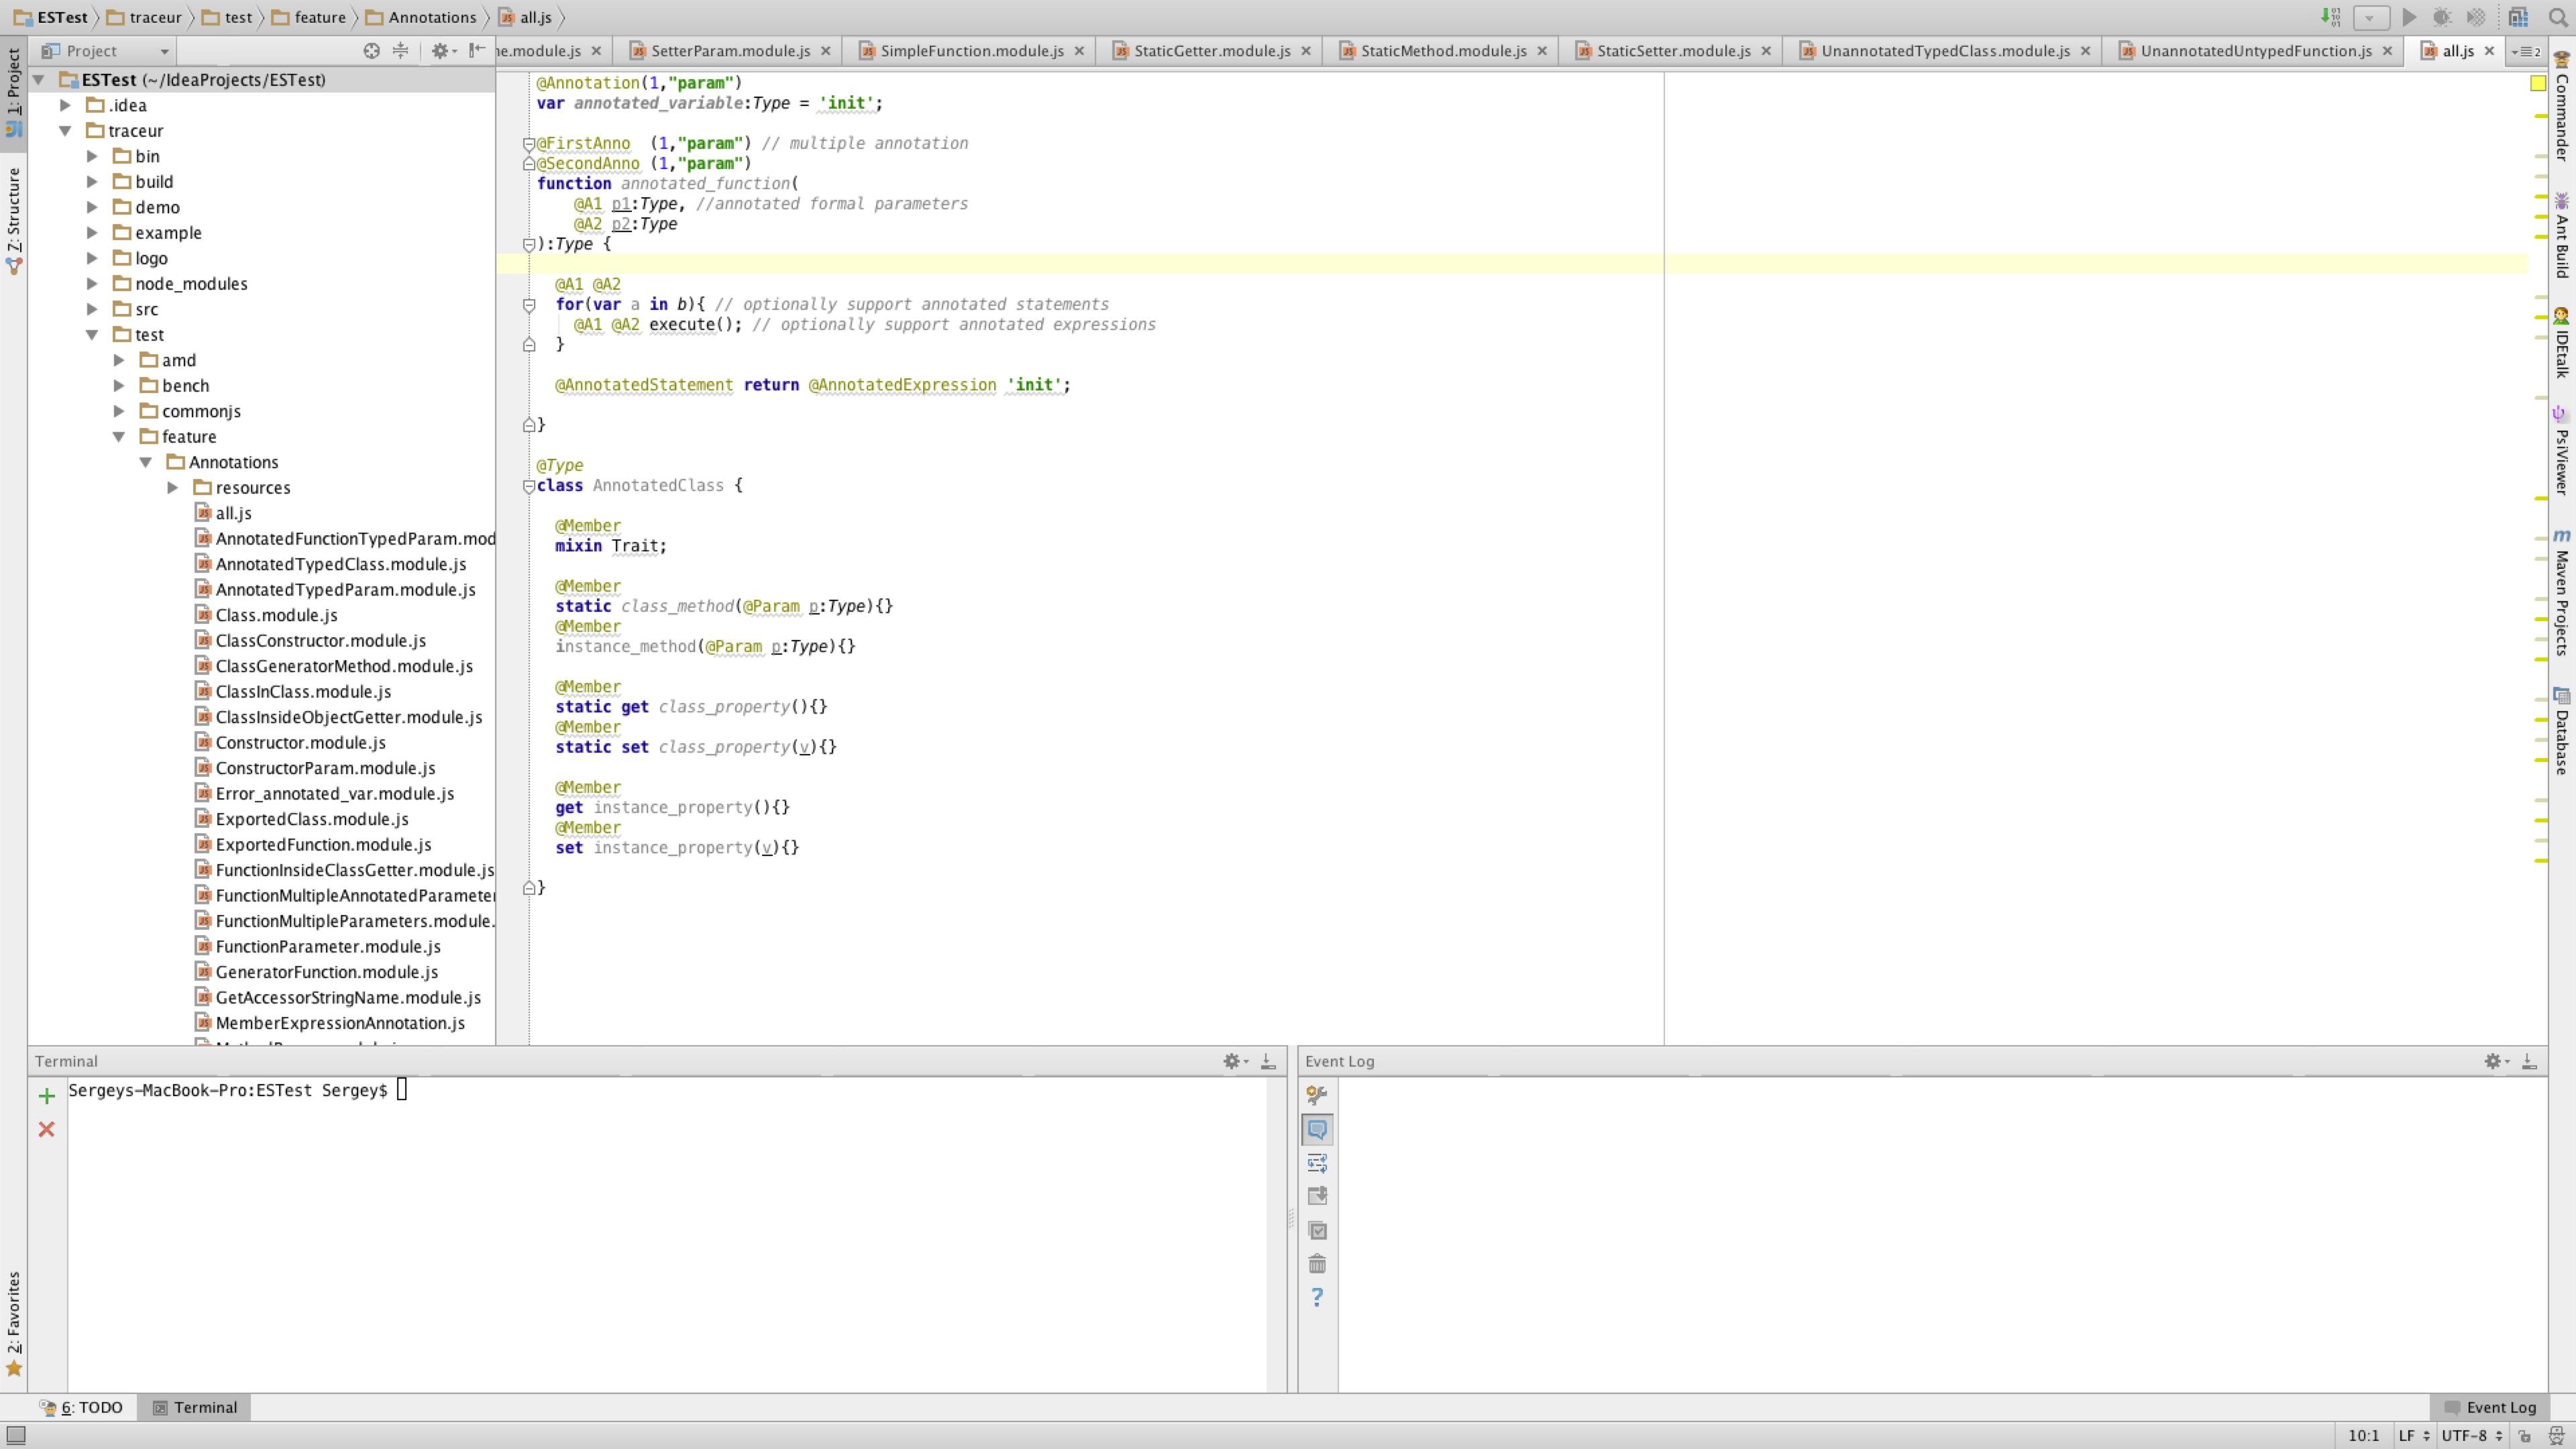 Screenshot #14849